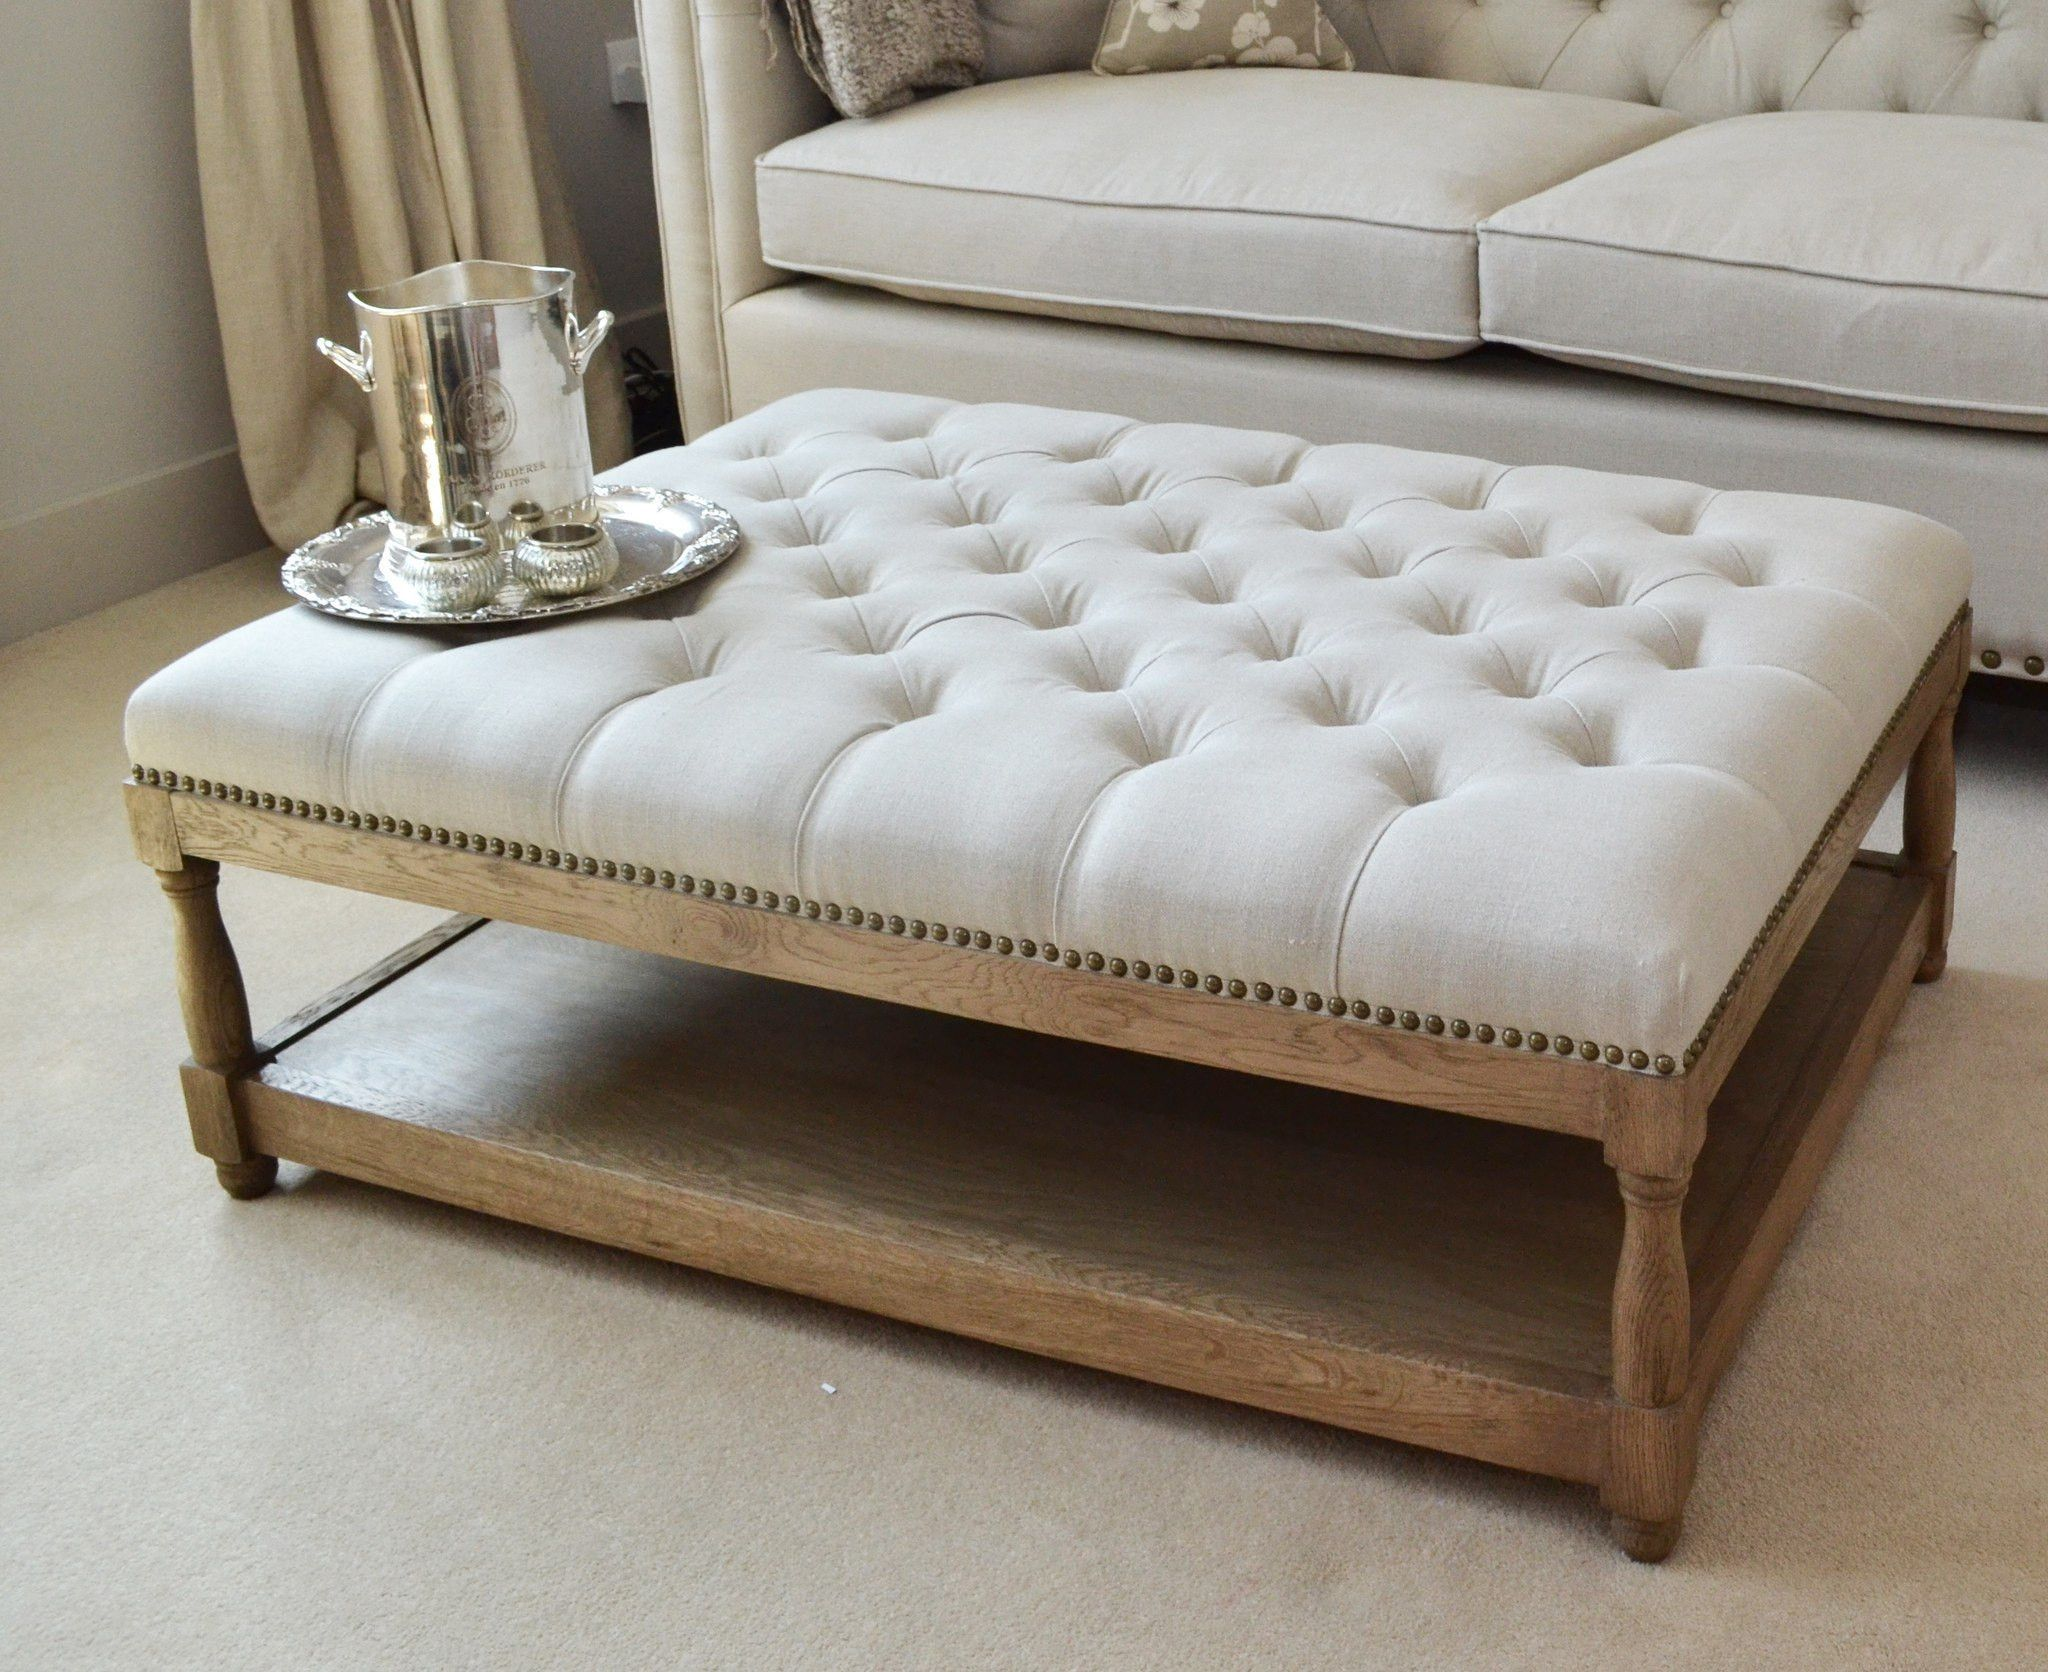 Ottoman - Upholstered Petit Royale Ottoman Coffee Table - Oatmeal ...